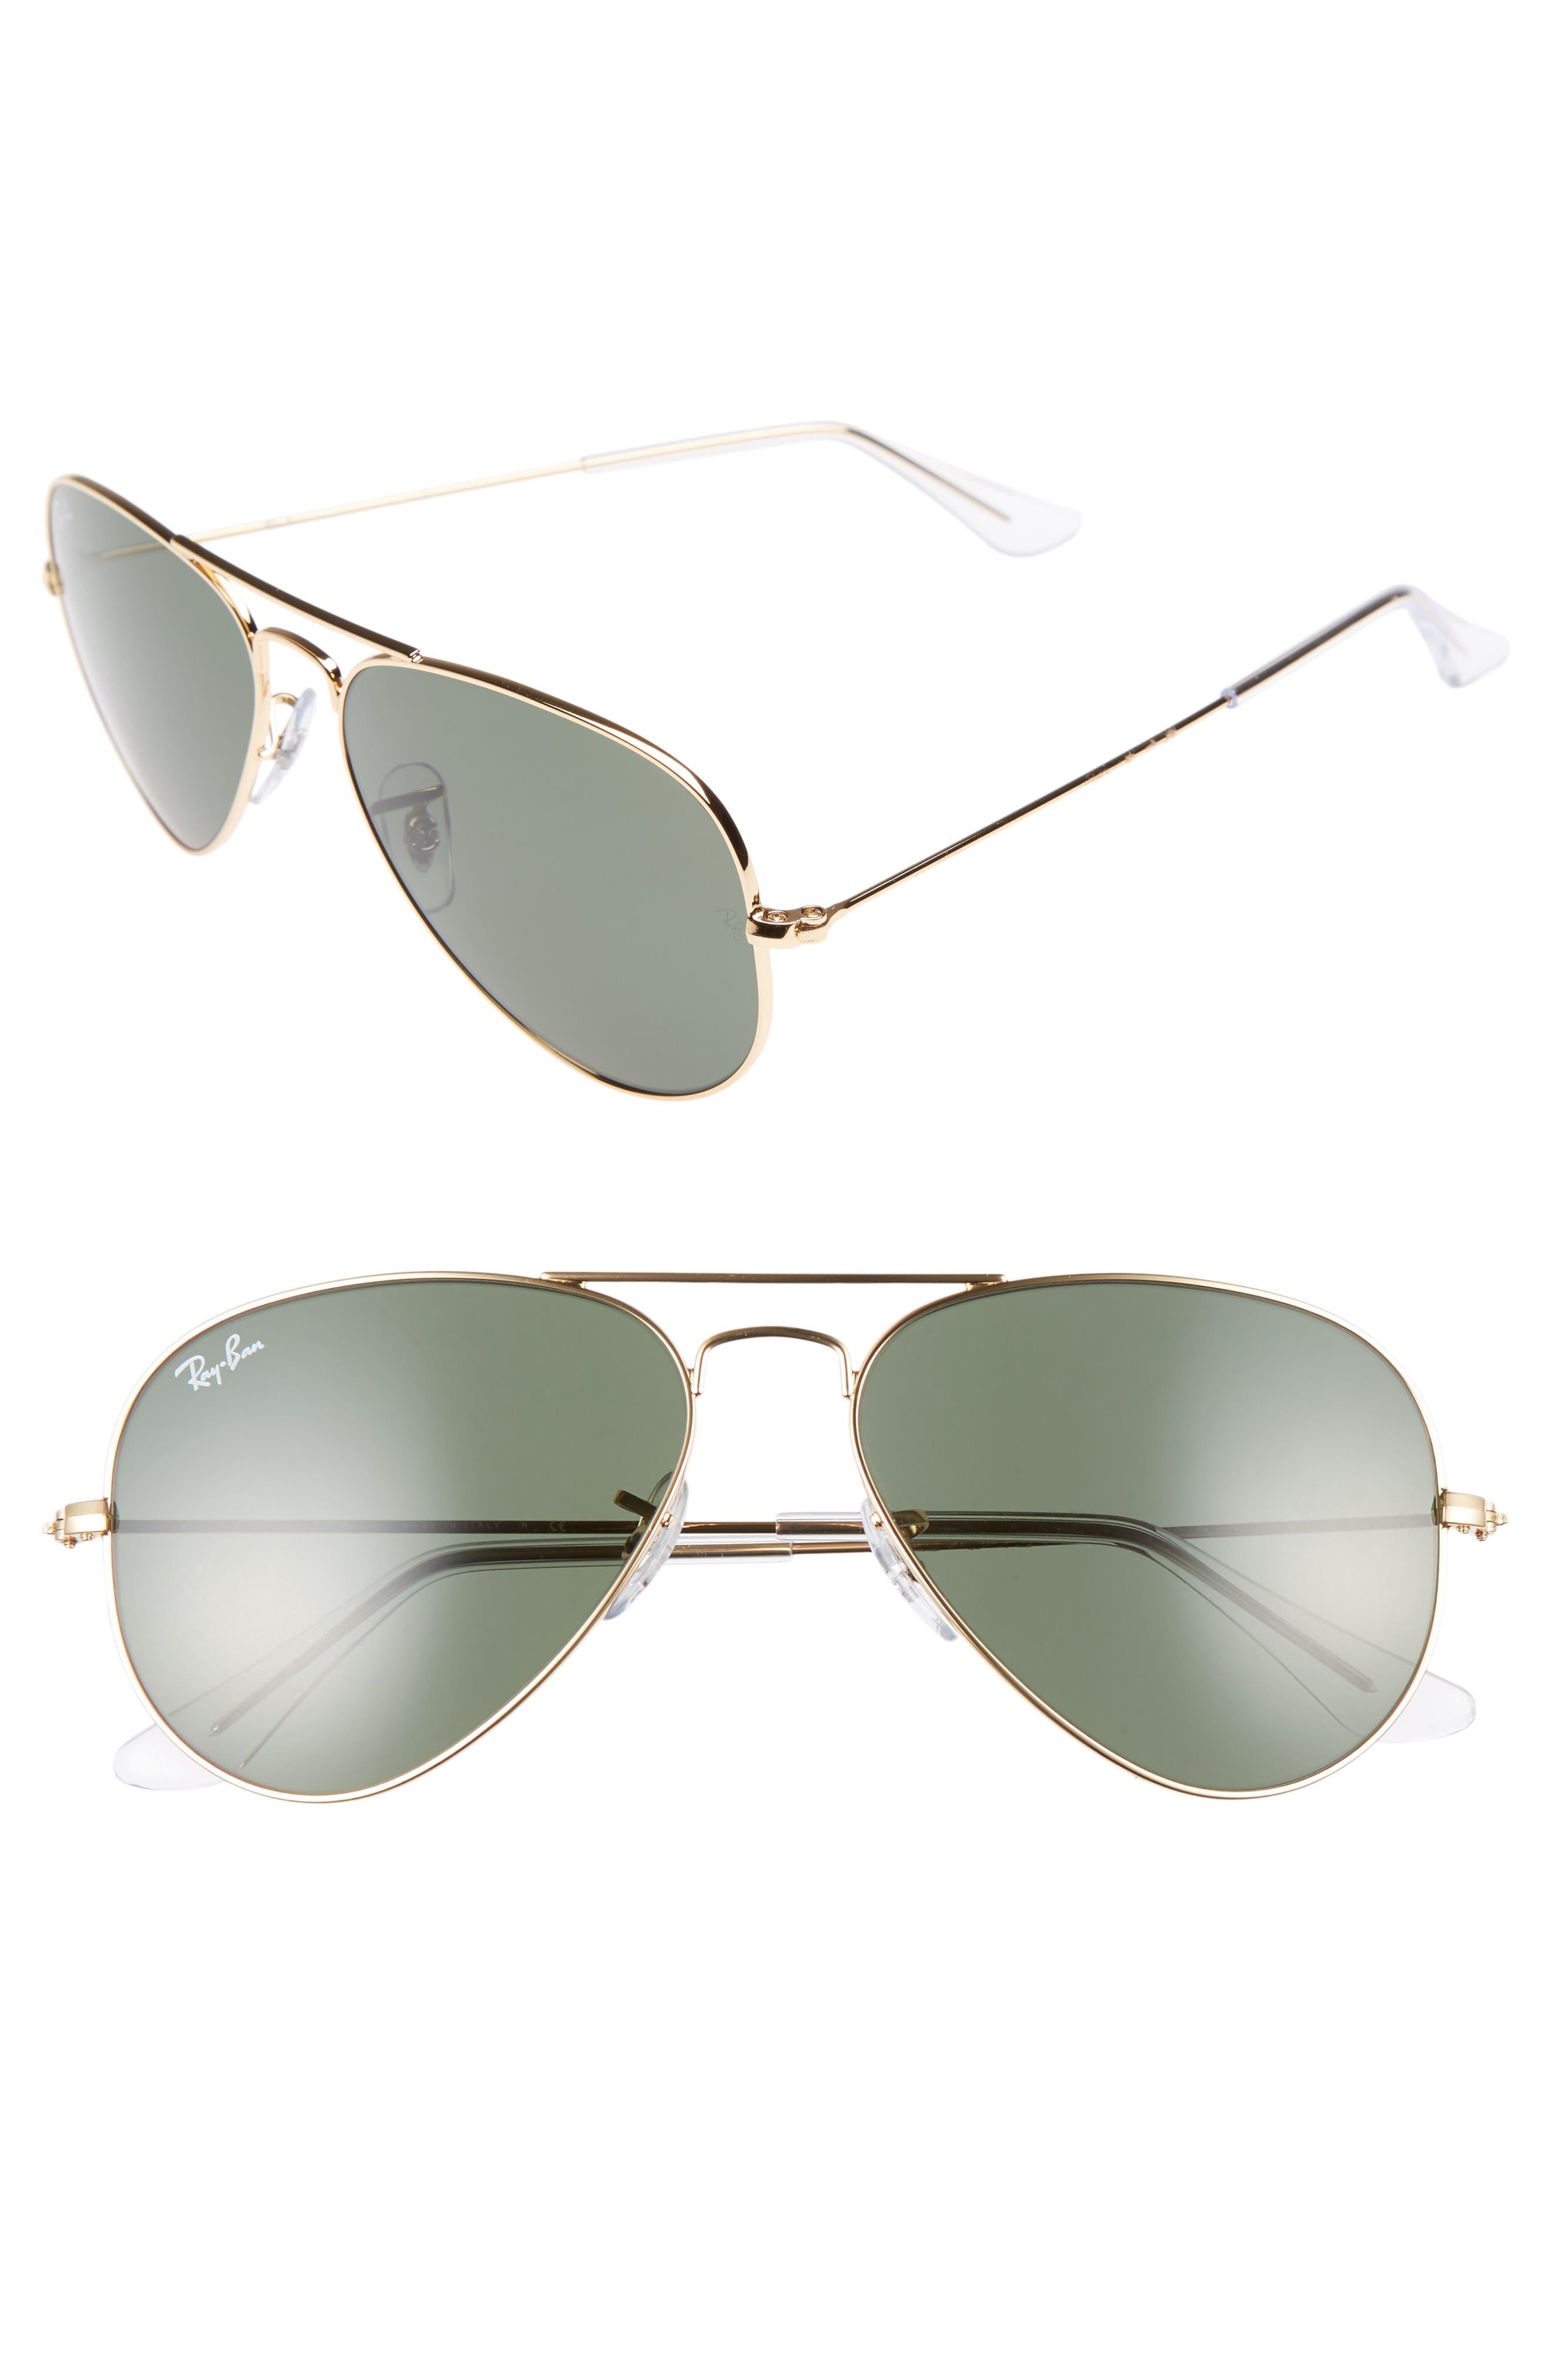 Alternate Image 1 Selected - Ray-Ban Small Original 55mm Aviator Sunglasses